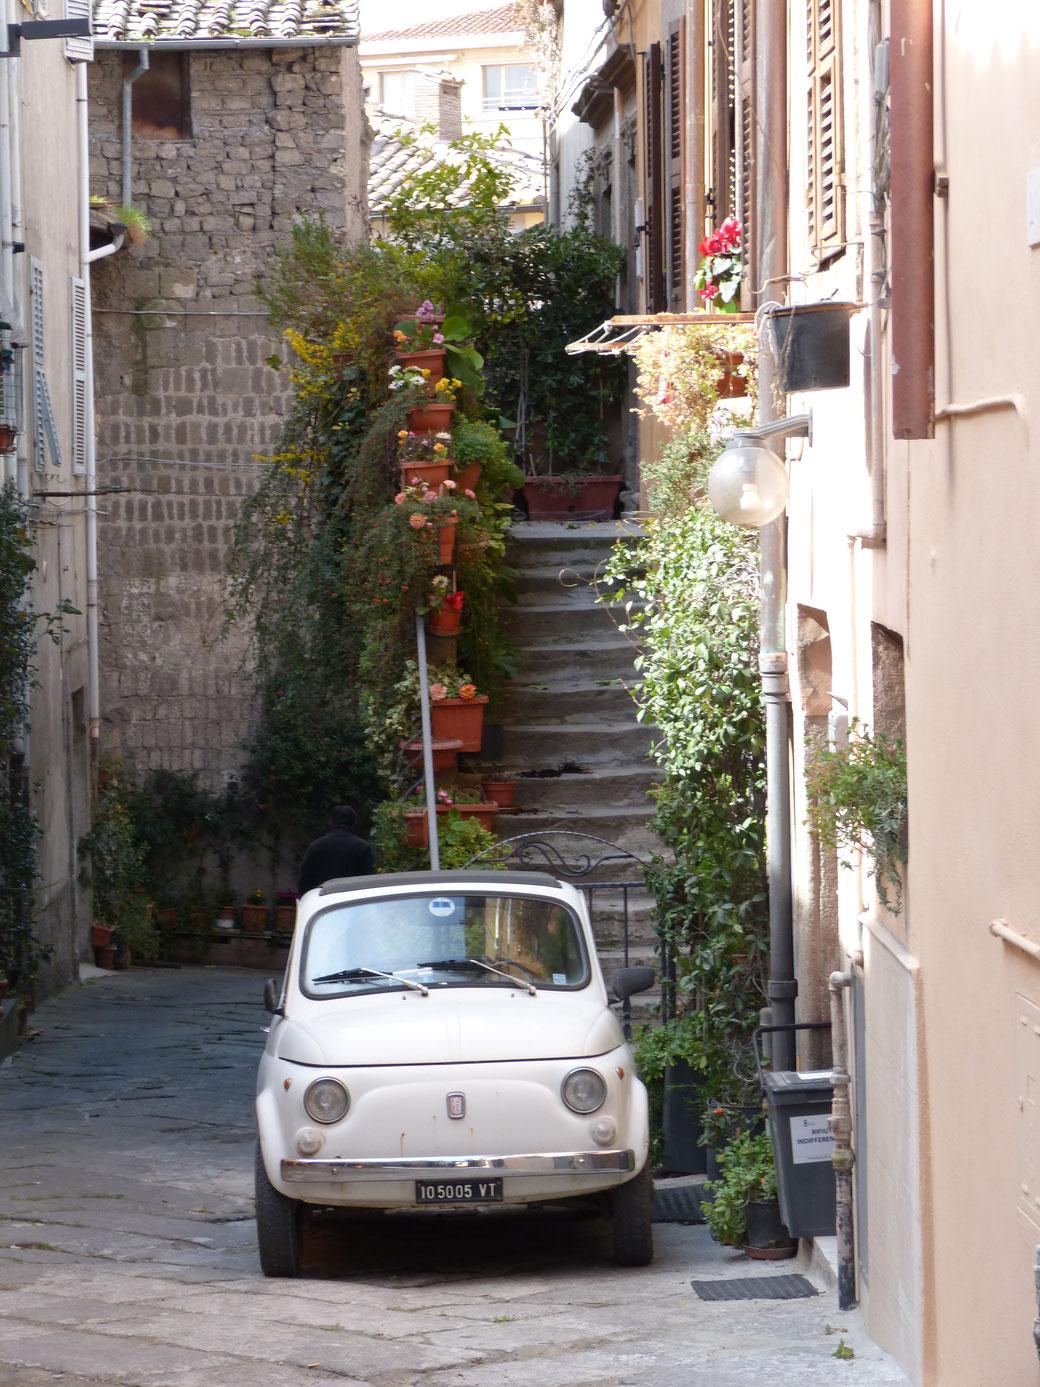 Altstadt-Impression aus Viterbo